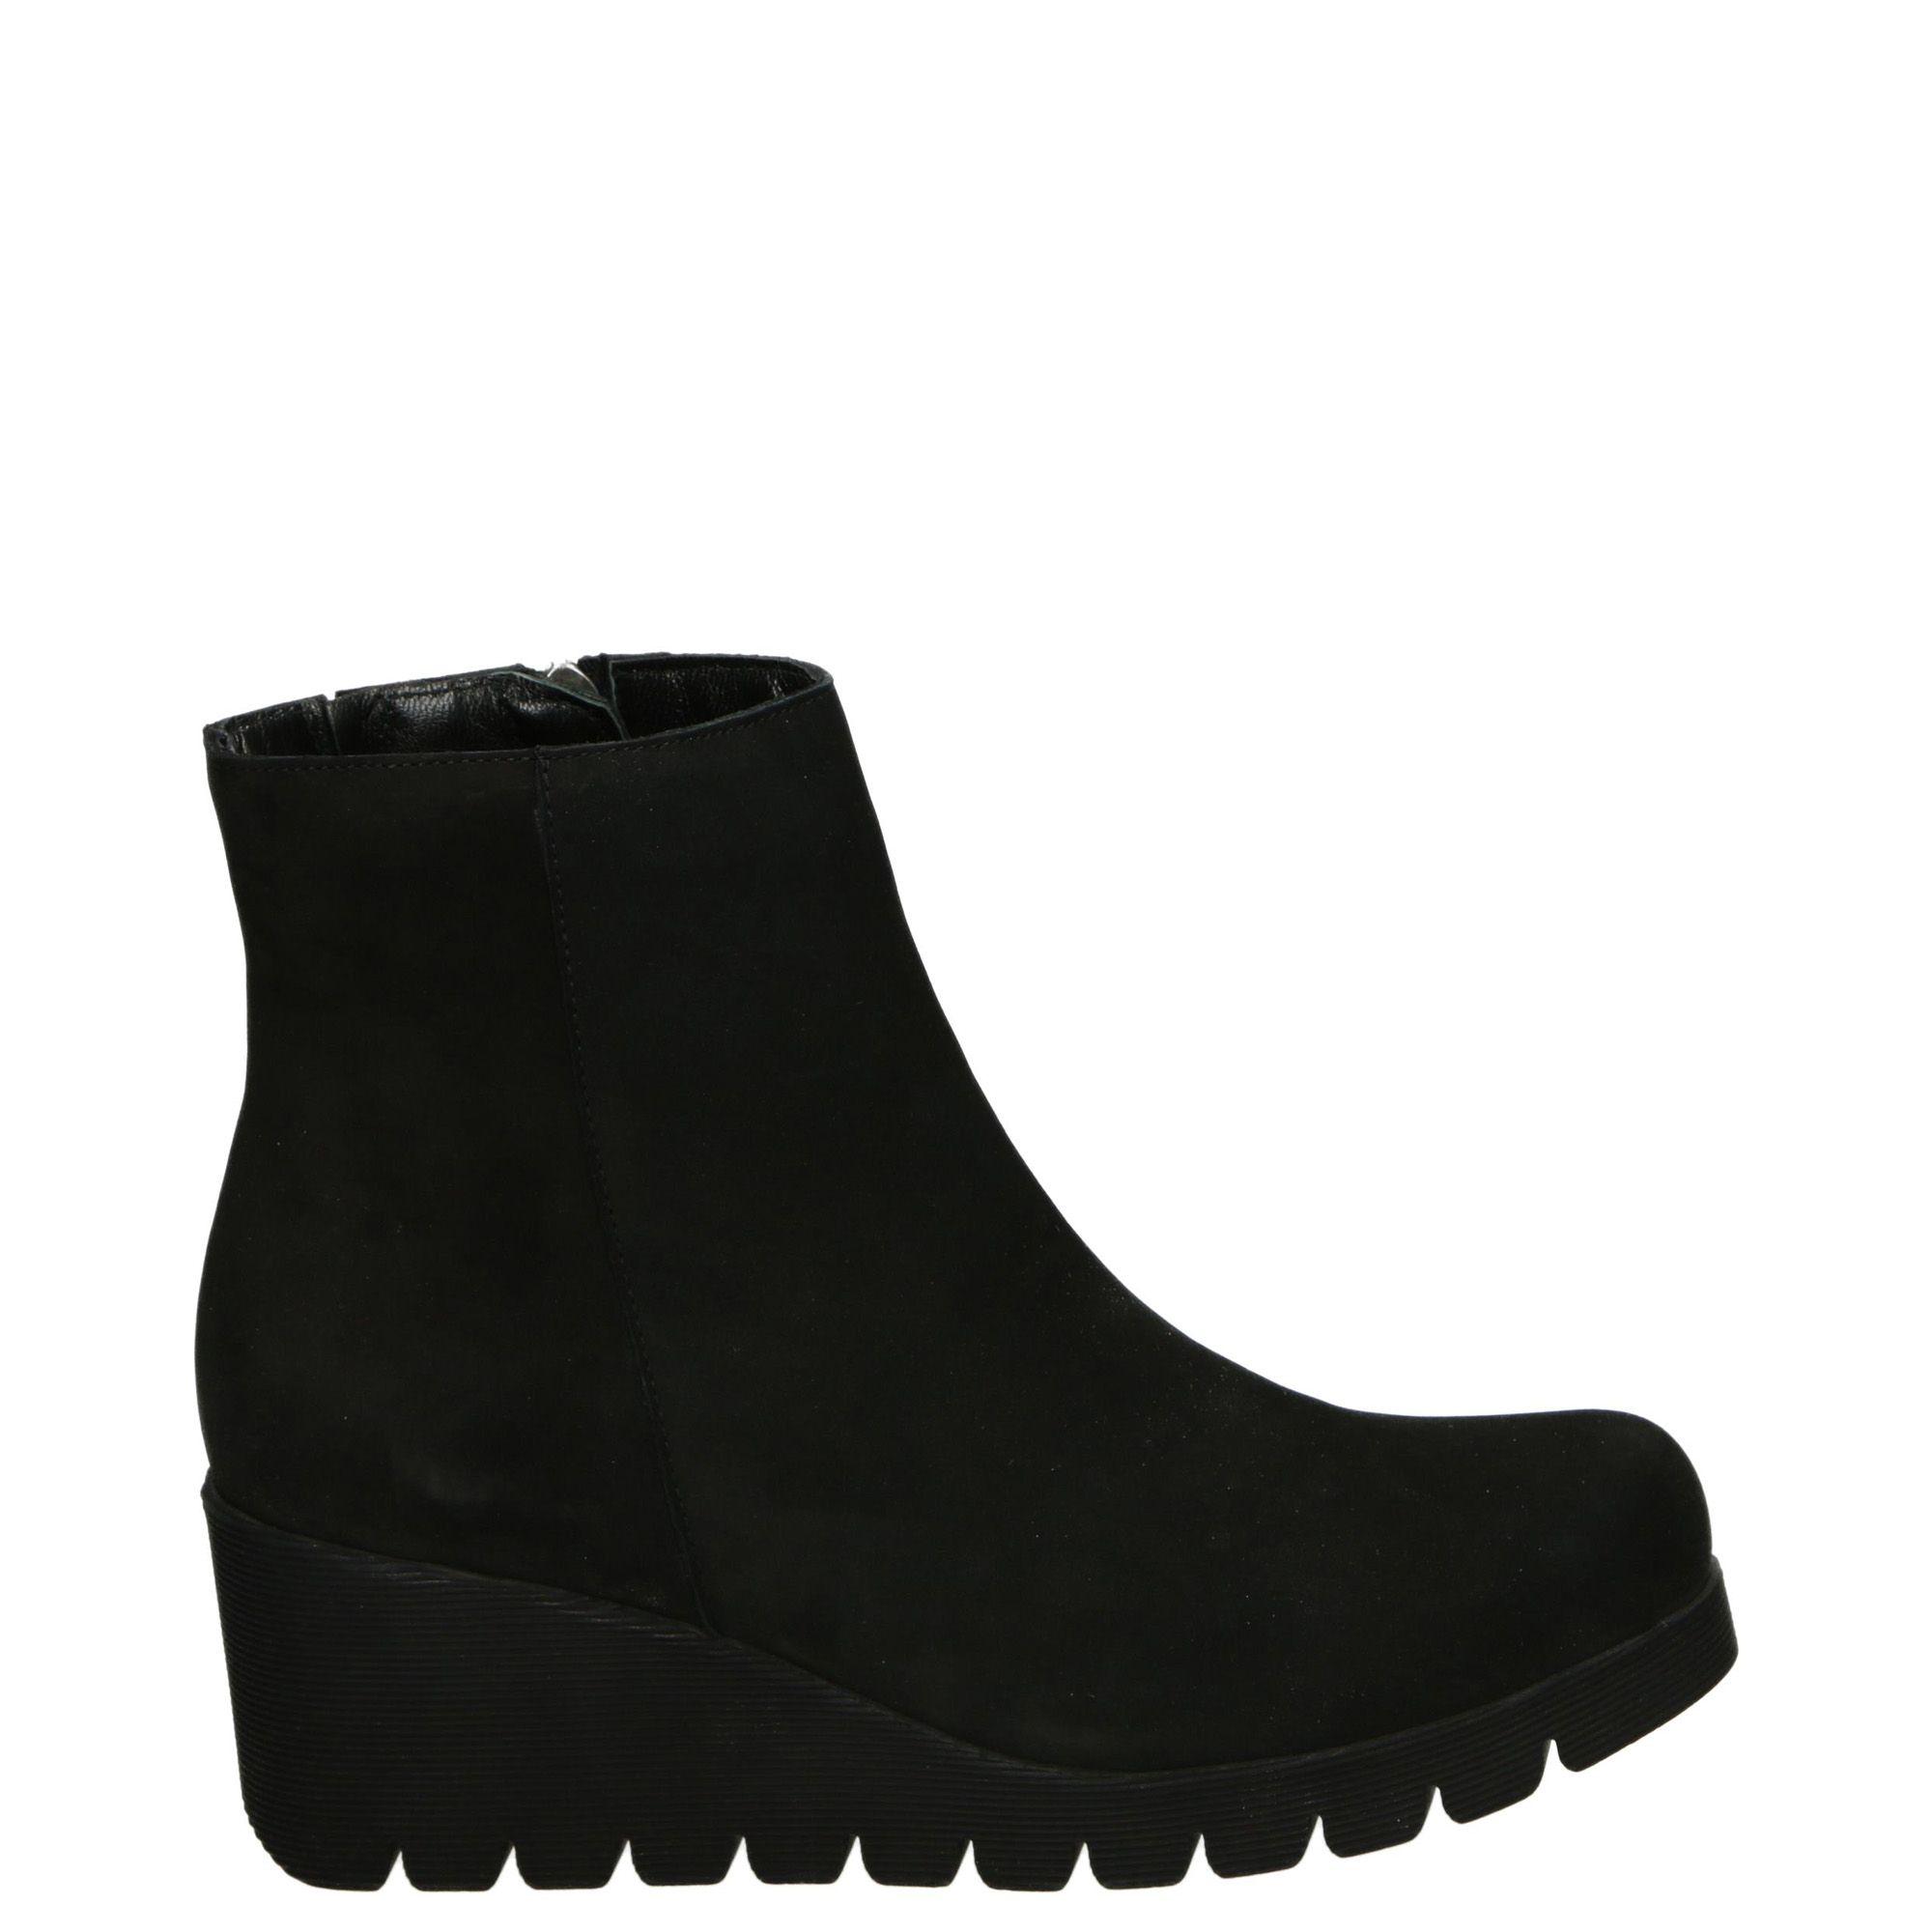 Venezia Sklep Internetowy Z Butami Boots Wedge Boot Shoes